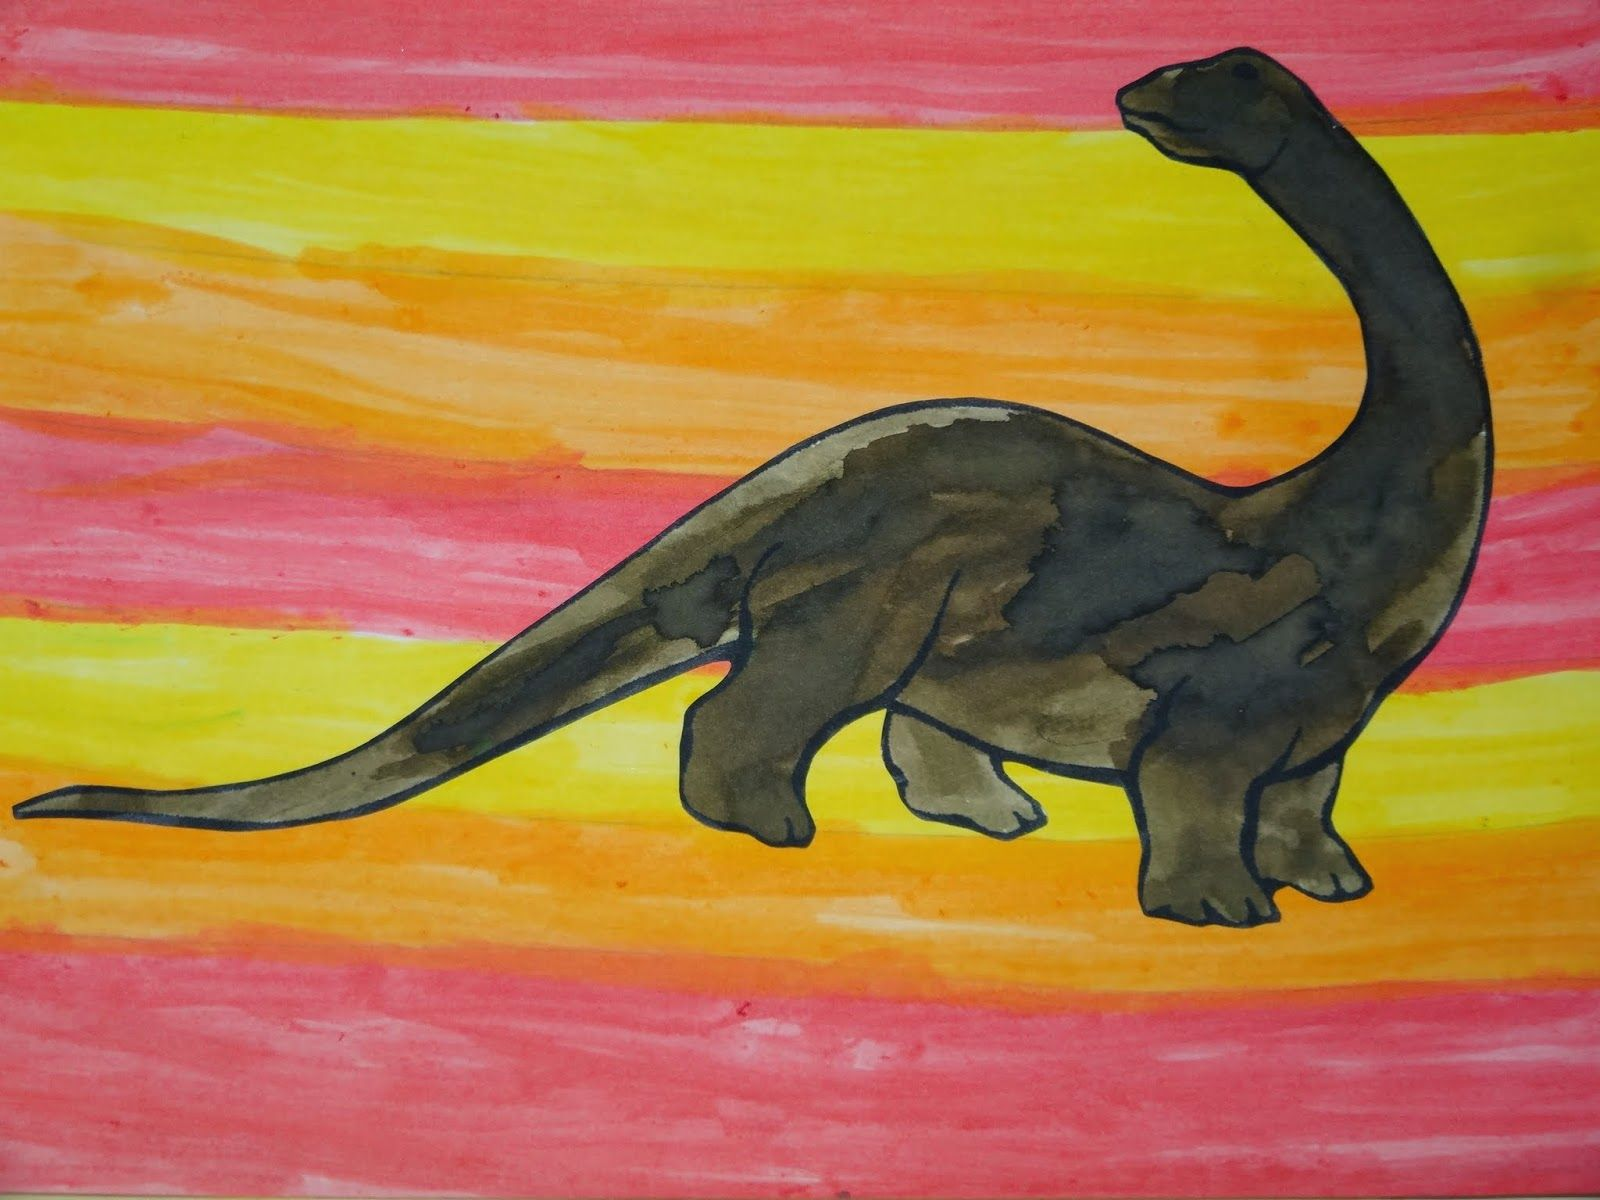 La maternelle de Luciole peinture herbivores dinosaures 12